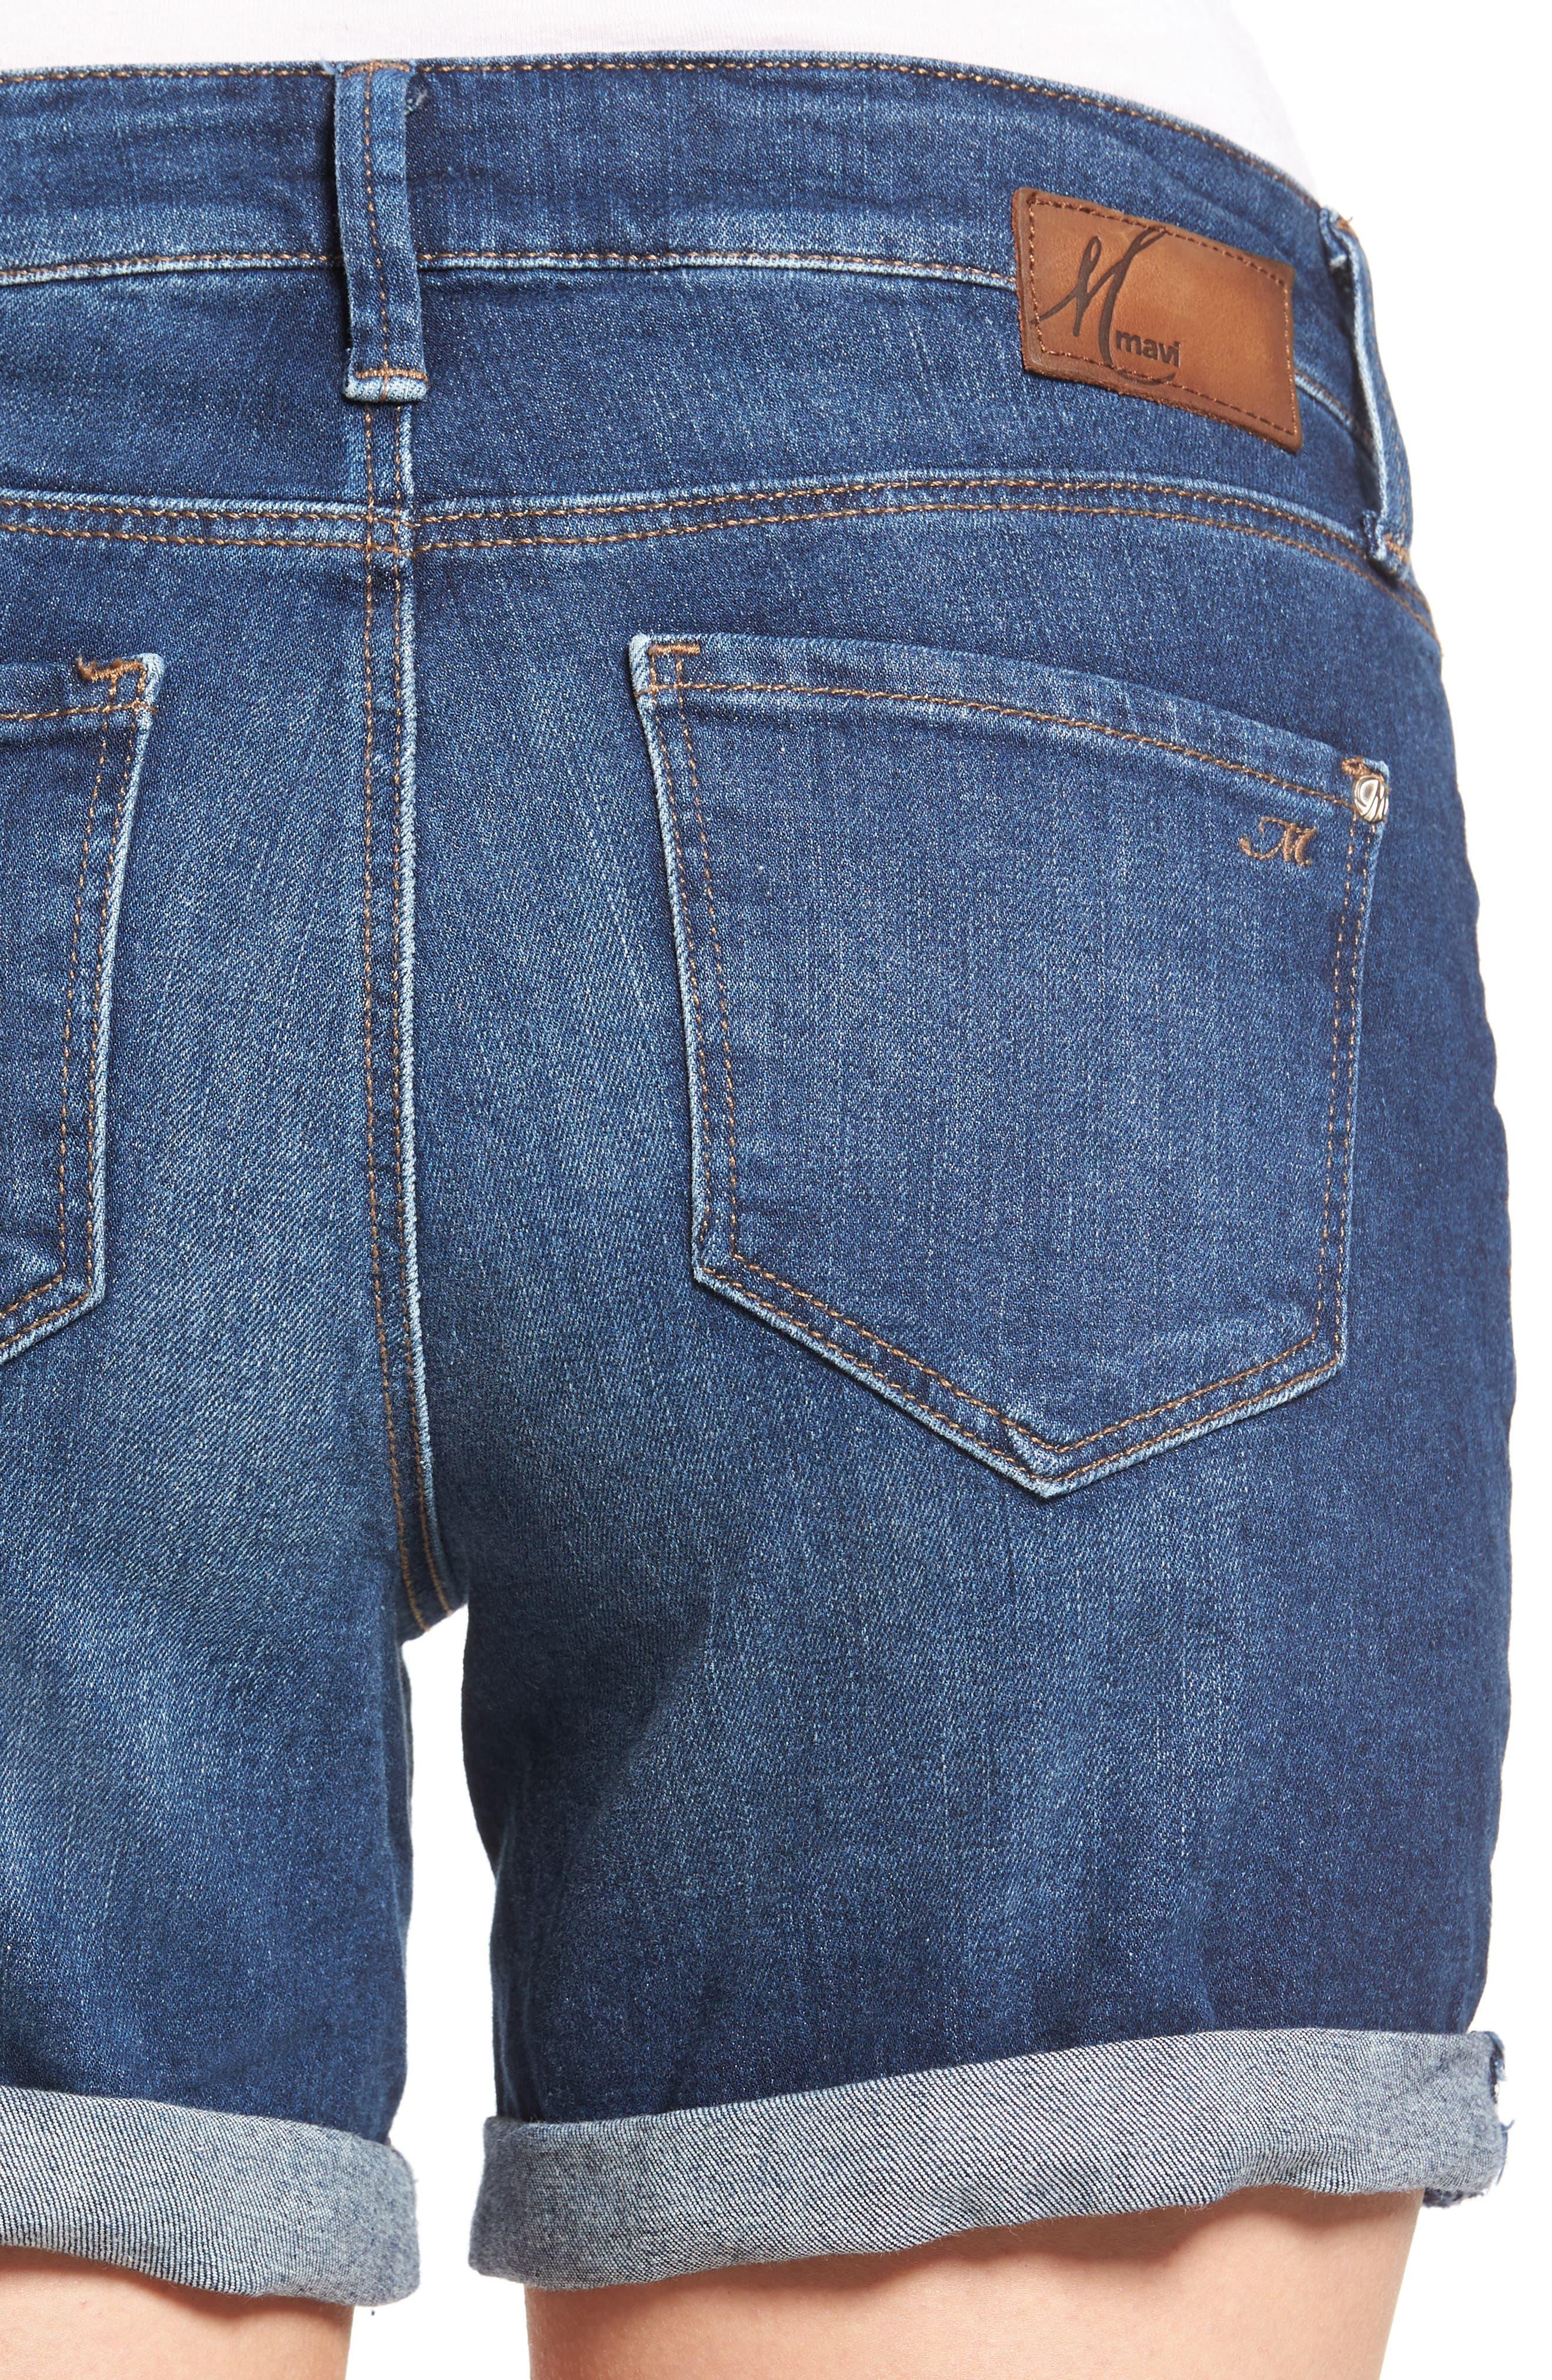 Marla Roll Cuff Denim Shorts,                             Alternate thumbnail 4, color,                             401